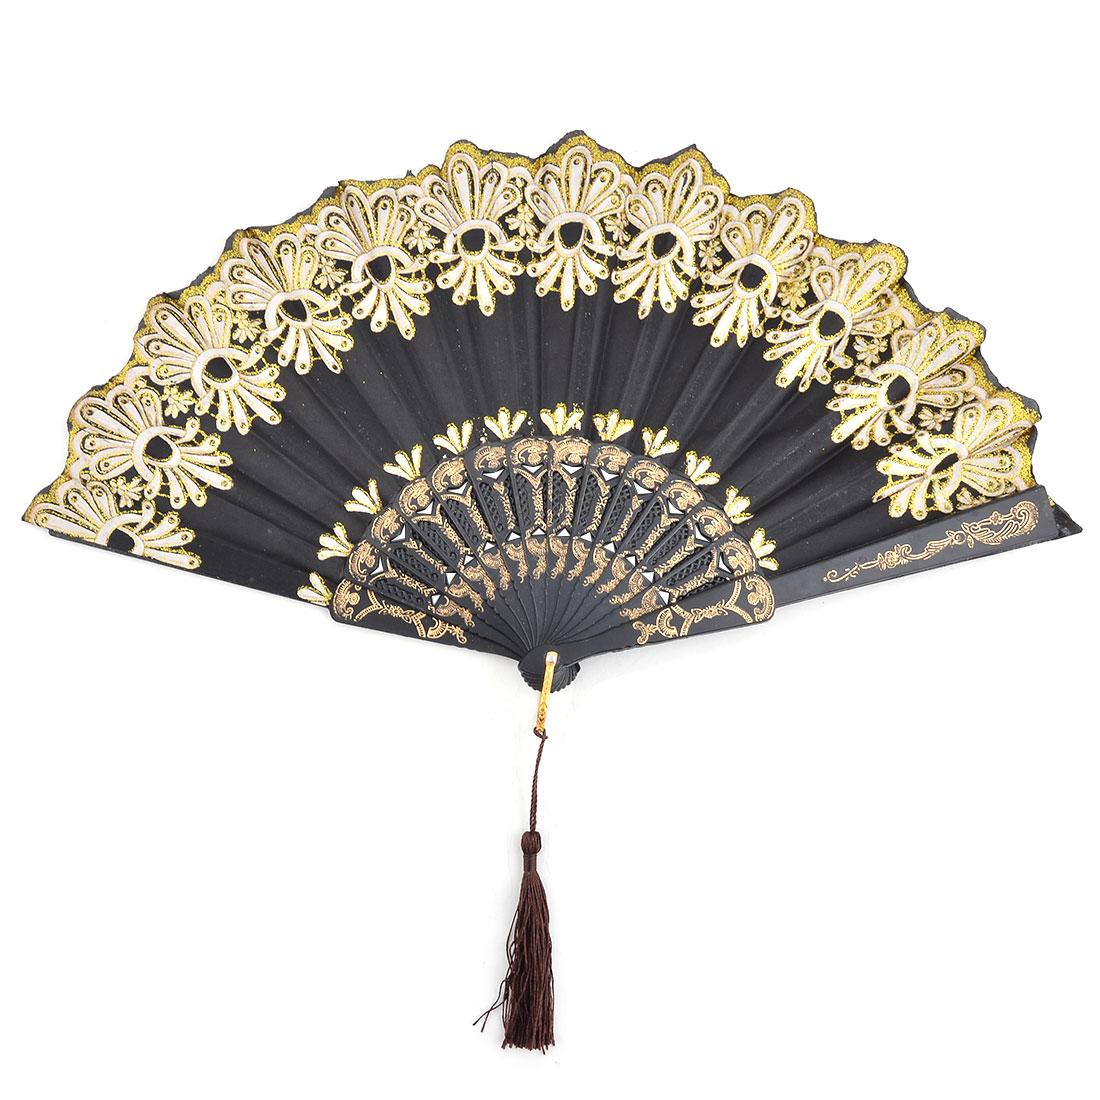 Lady Plastic Frame Floral Print Folding Dancing Cooling Hand Fan Black 23.5cm Length